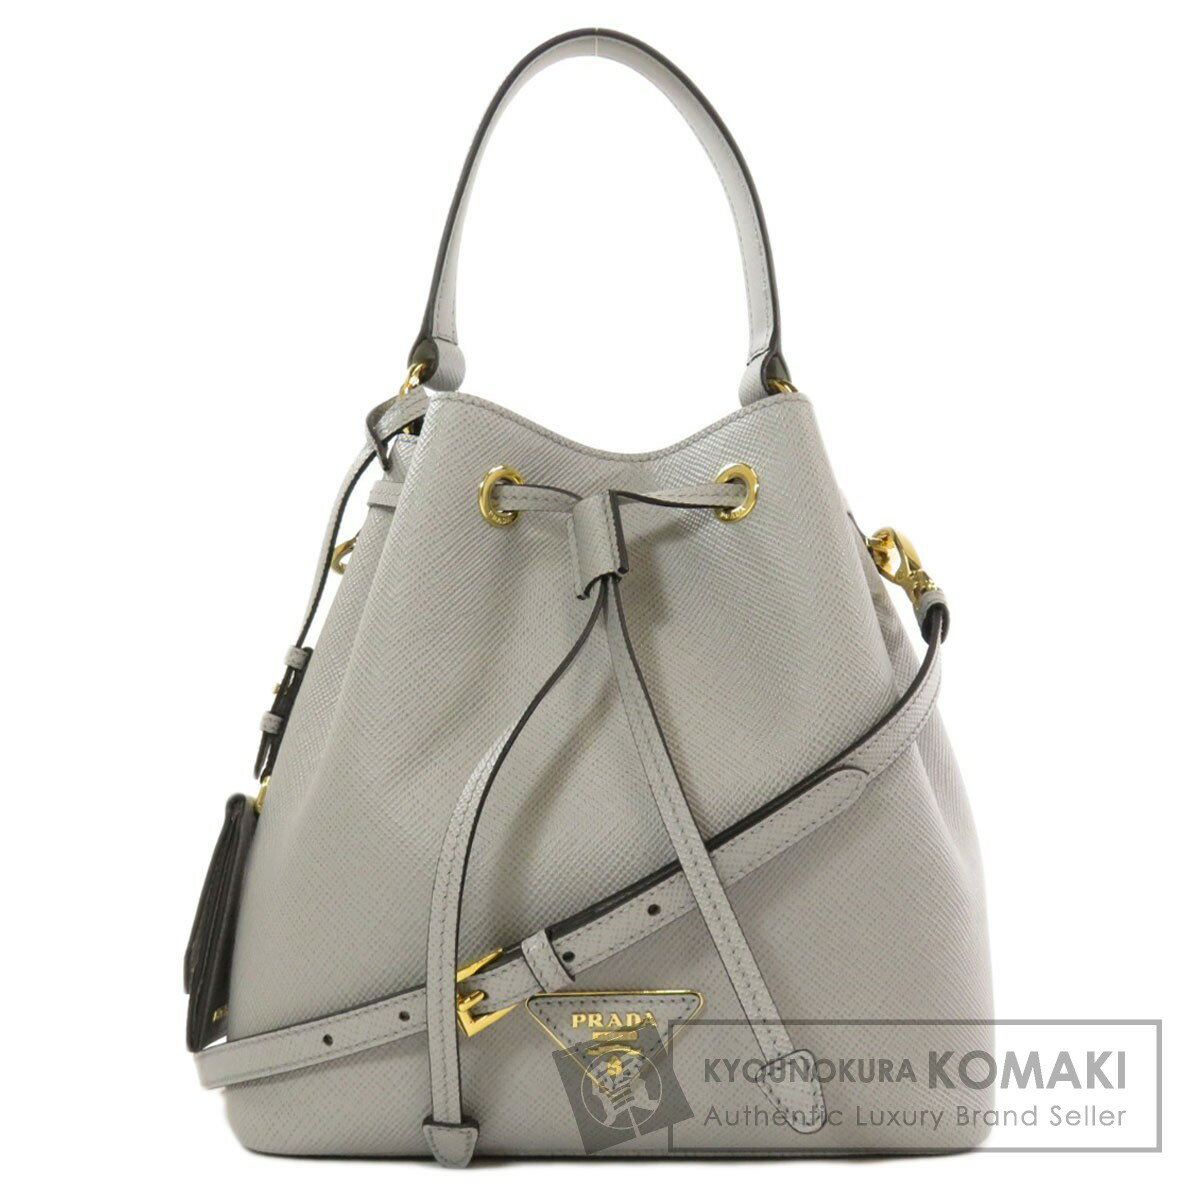 Prada 1BE032 Saffiano Cuir drawstring logo 2way handbag leather ladies [used] [PRADA]